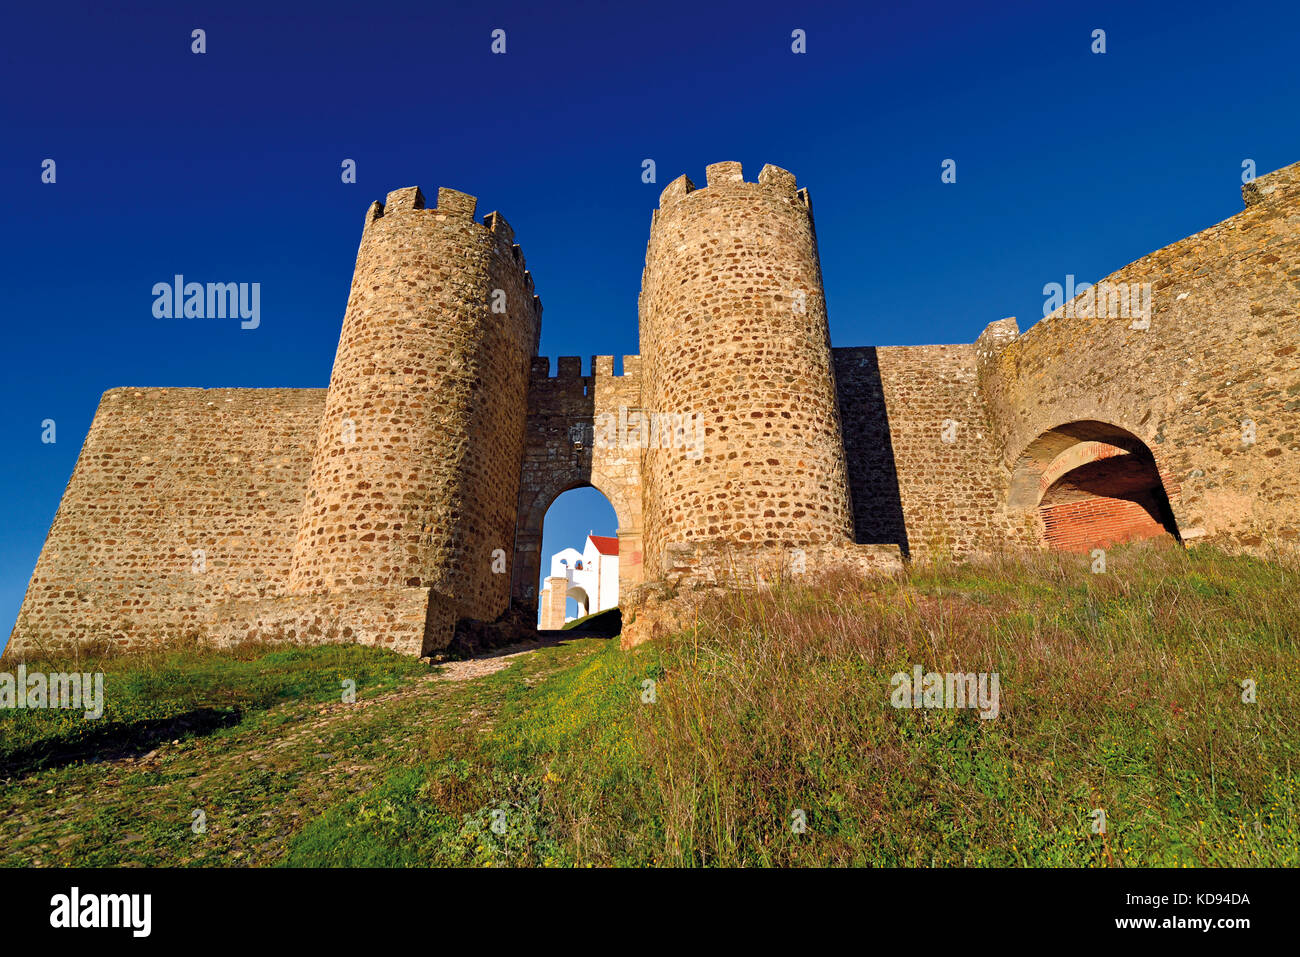 Portugal: Medieval castle walls of Evoramonte - Stock Image